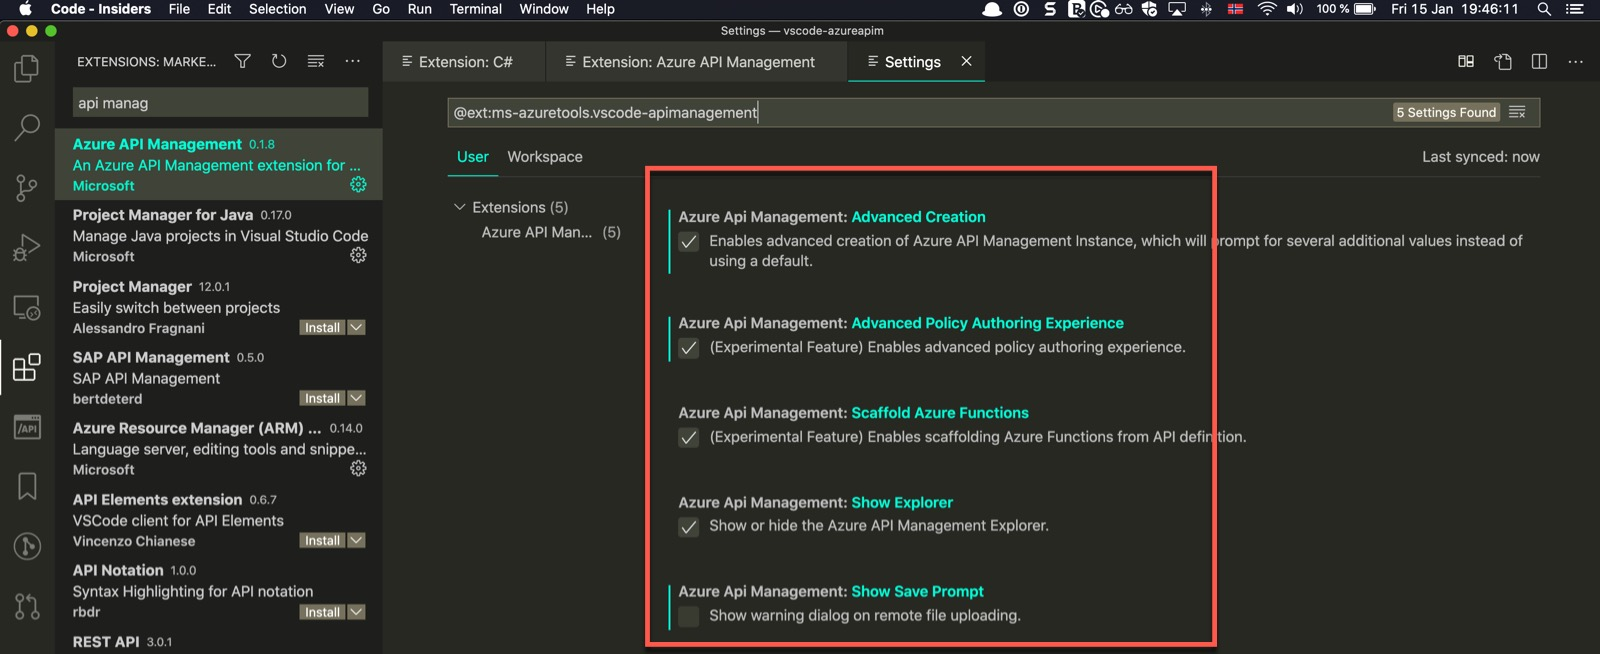 Configuring VSCode extension for Azure API Management